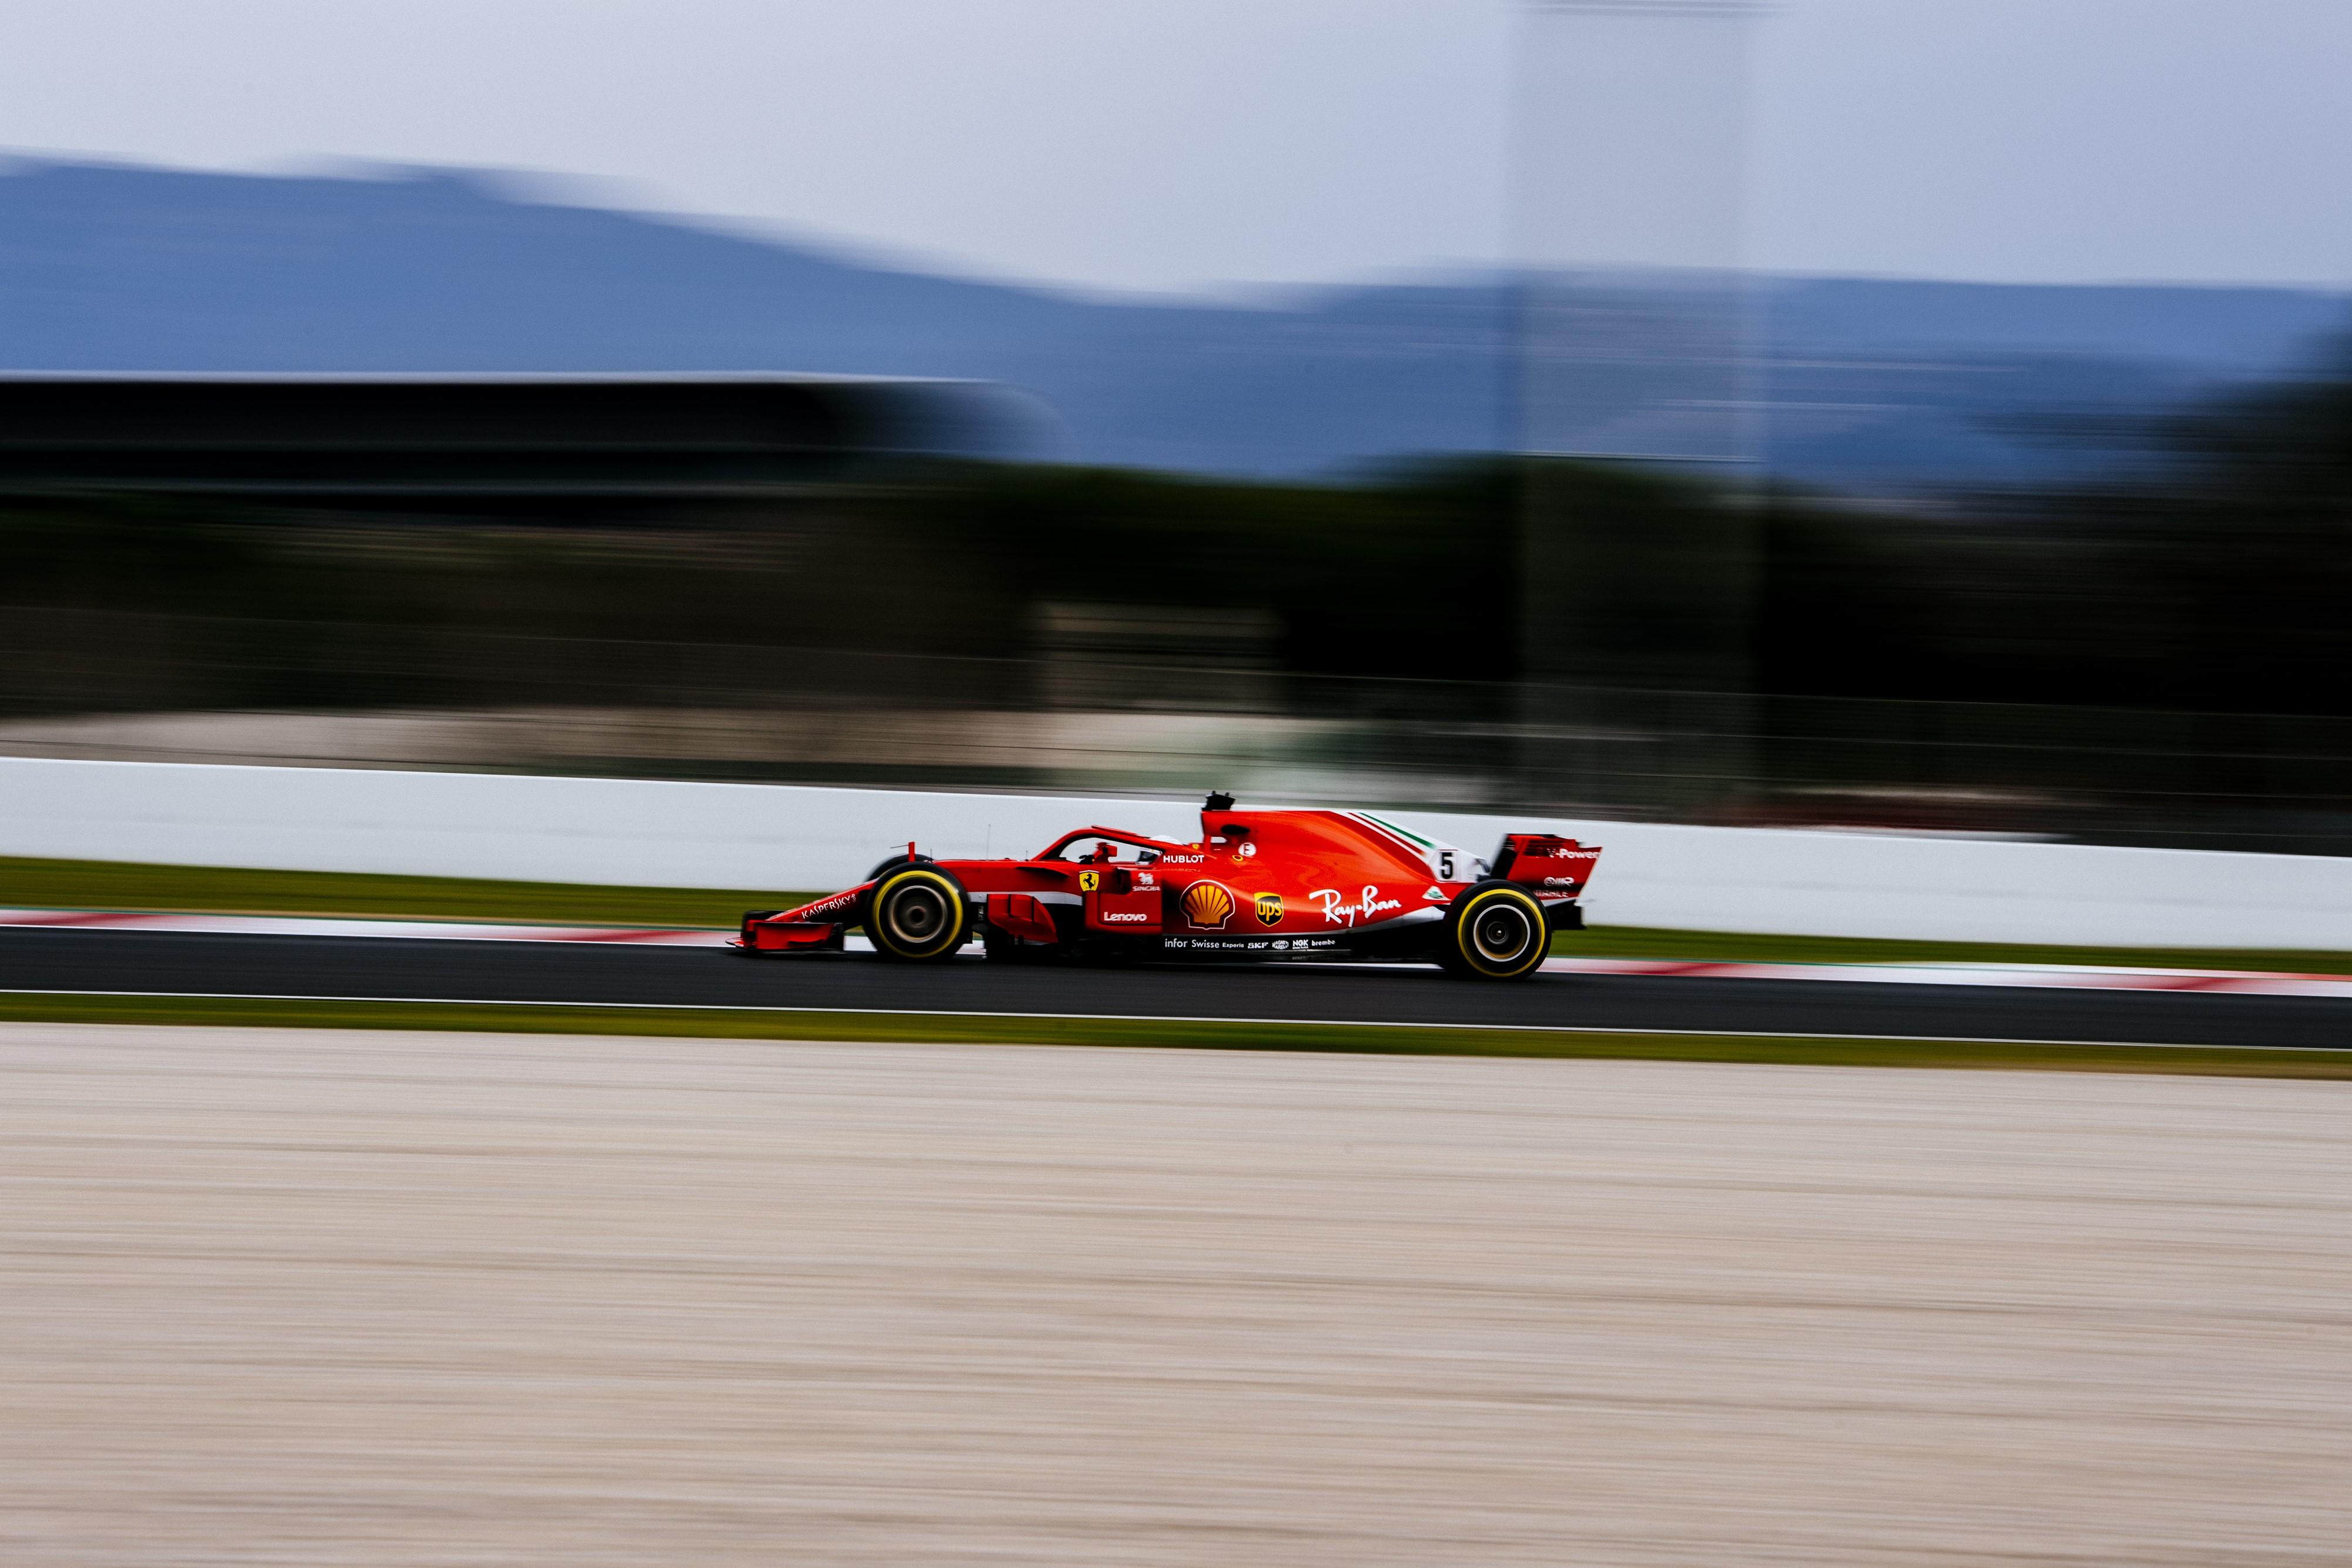 Sebastian Vettel (Ferrari) - Tests Montmelo 2018